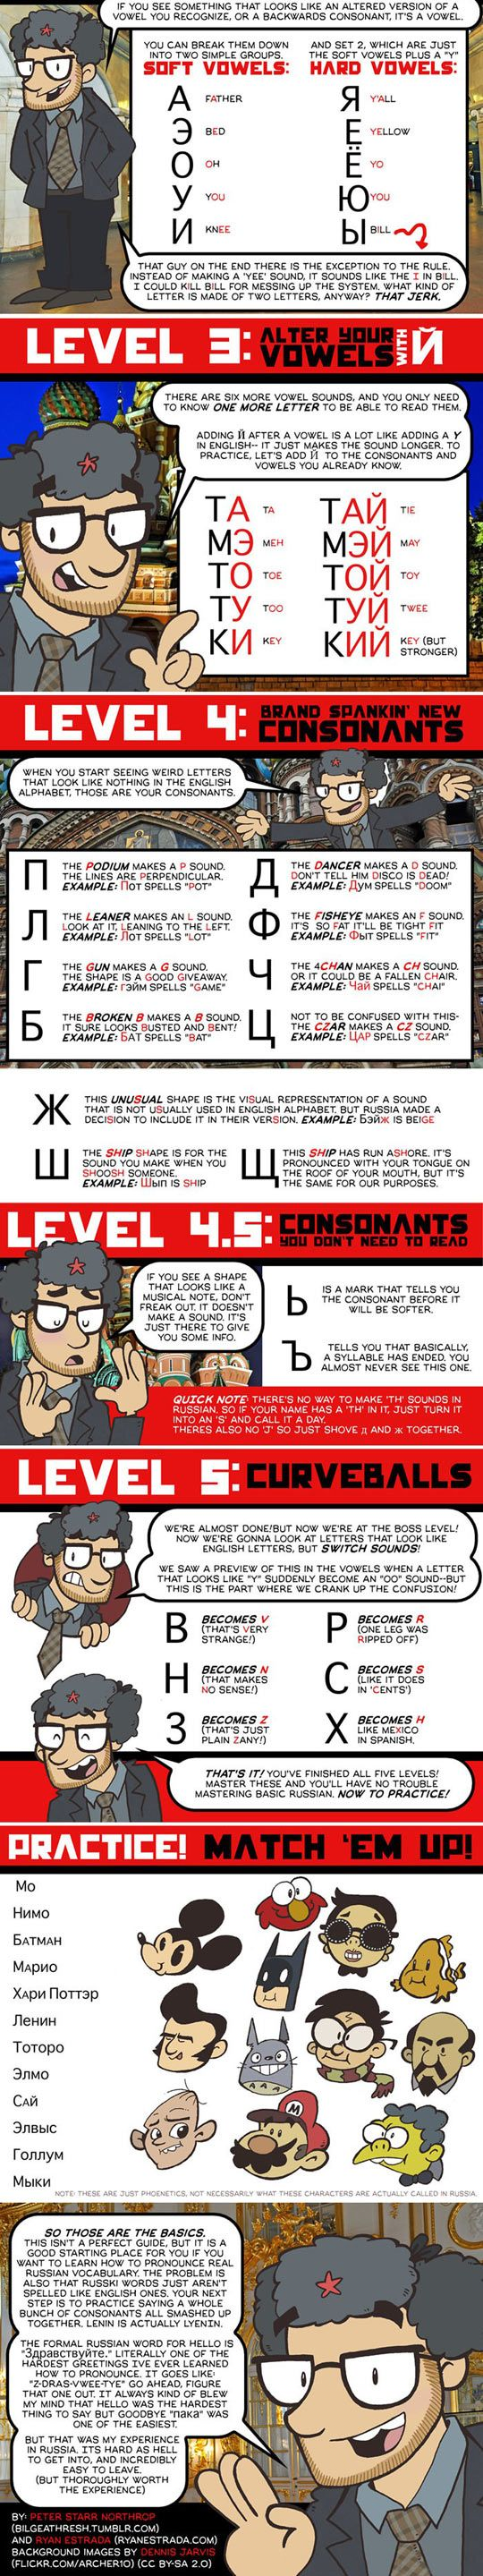 Very Useful Guide